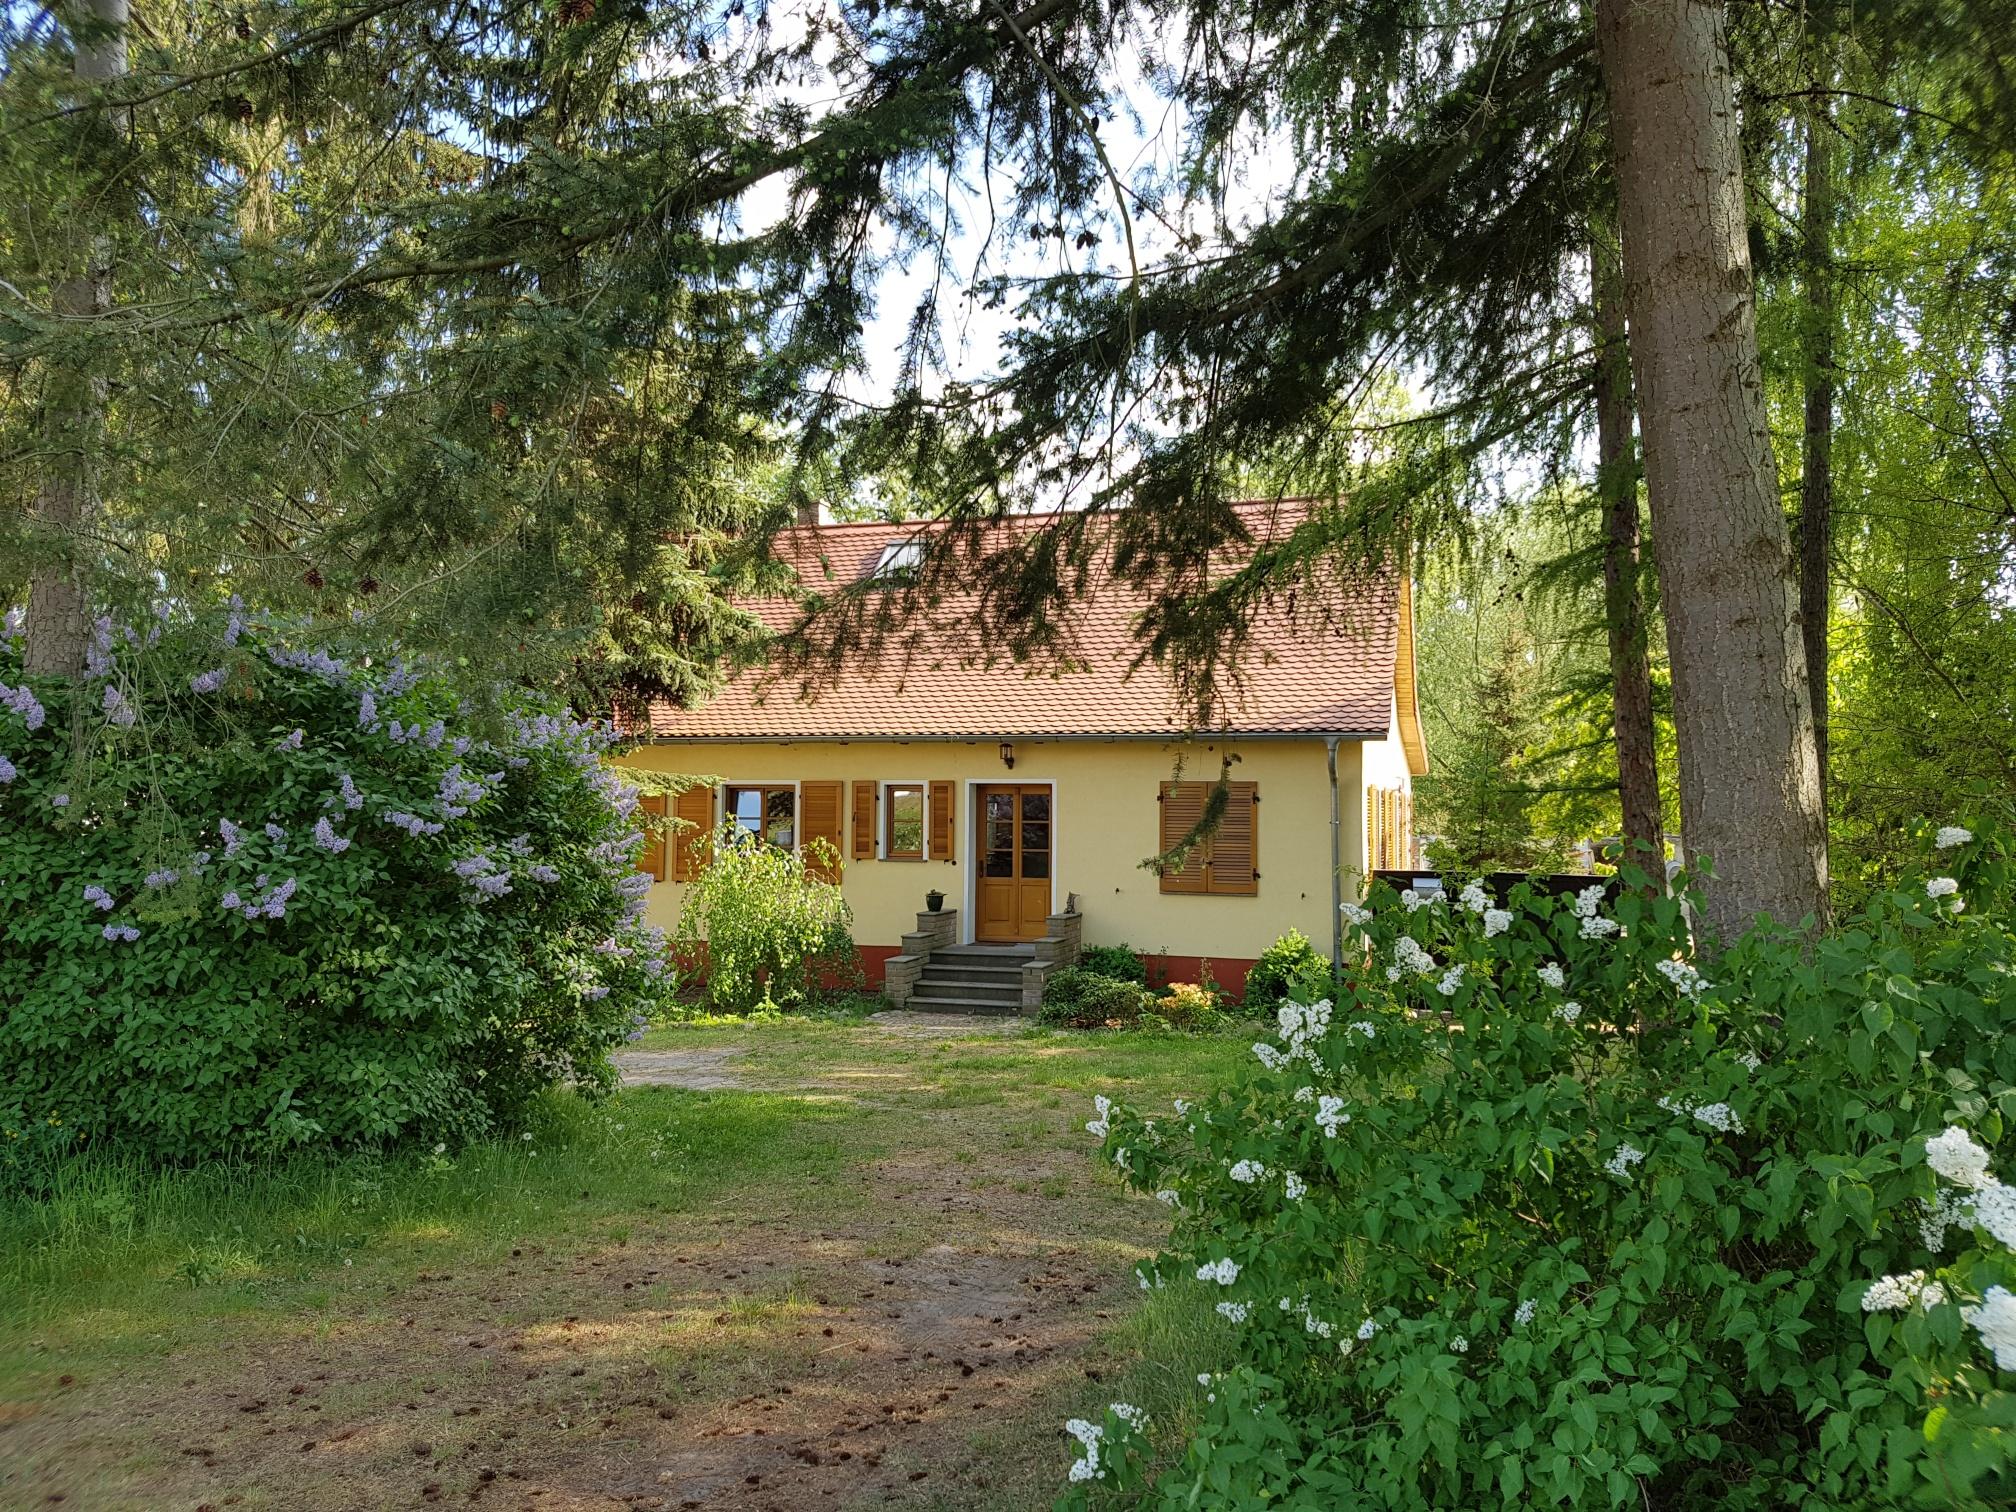 Das Ferienhaus Milow im Grünen